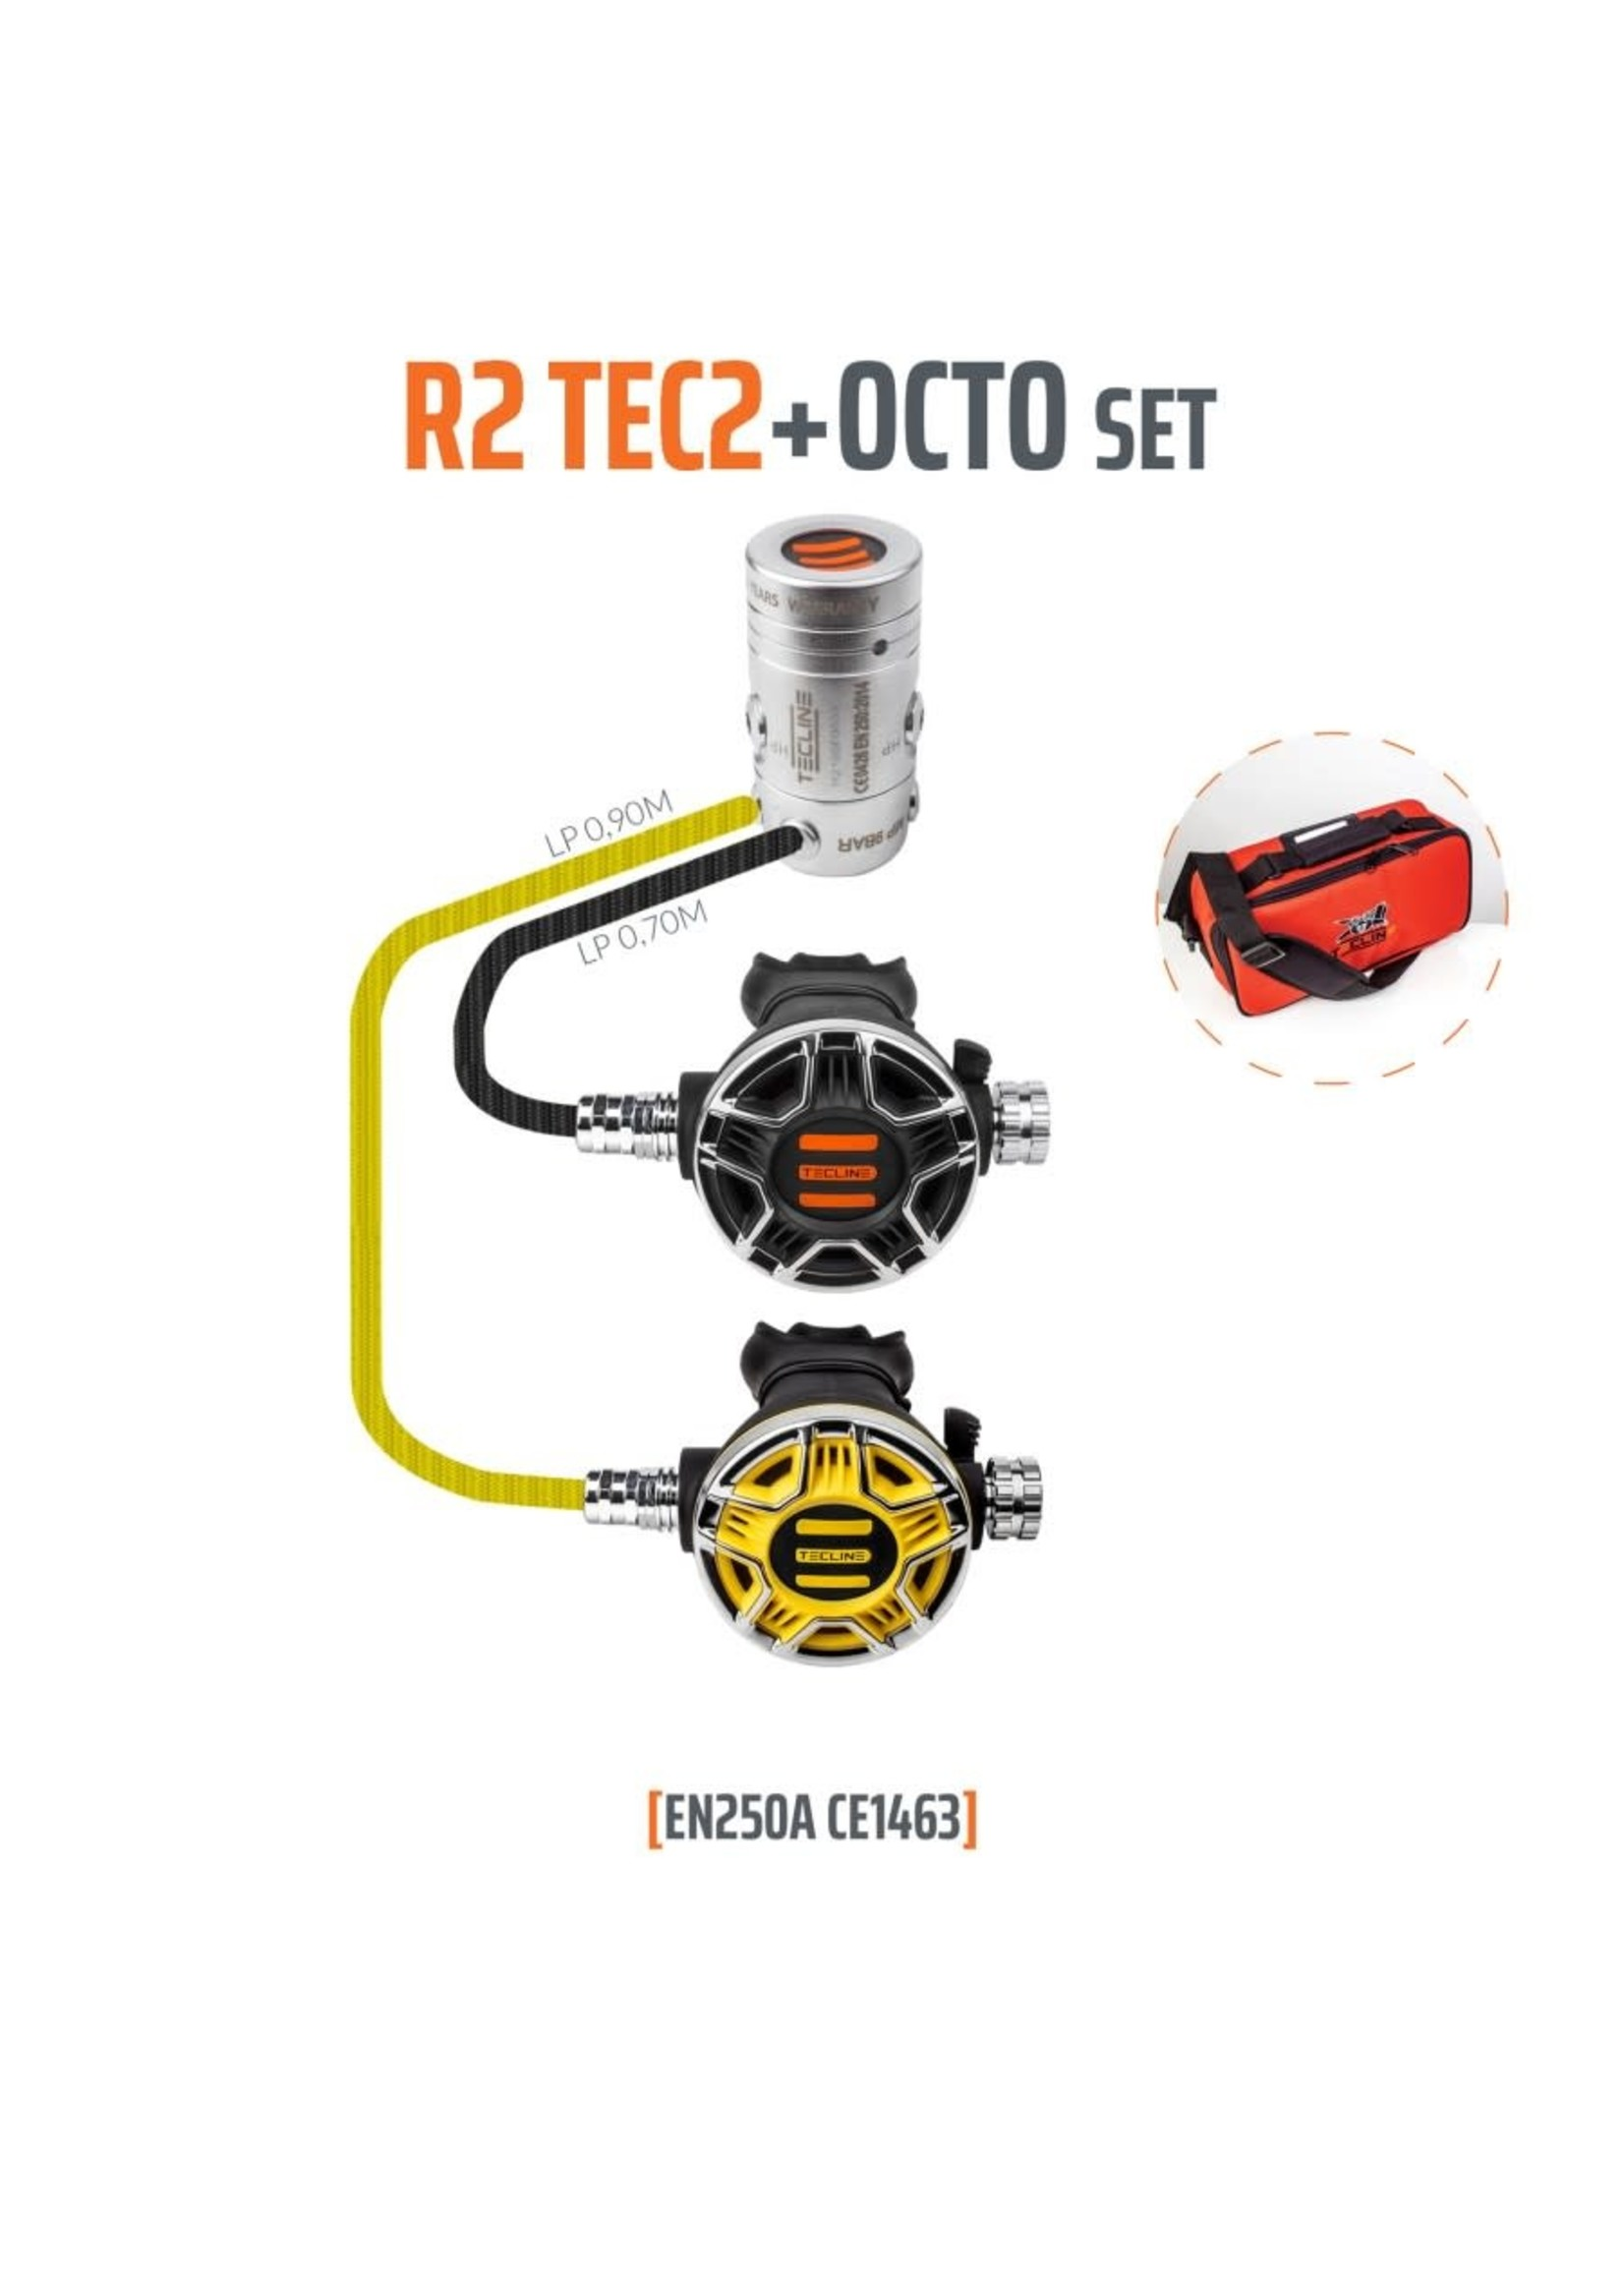 TecLine Tecline R2 TEC2 + Octo set